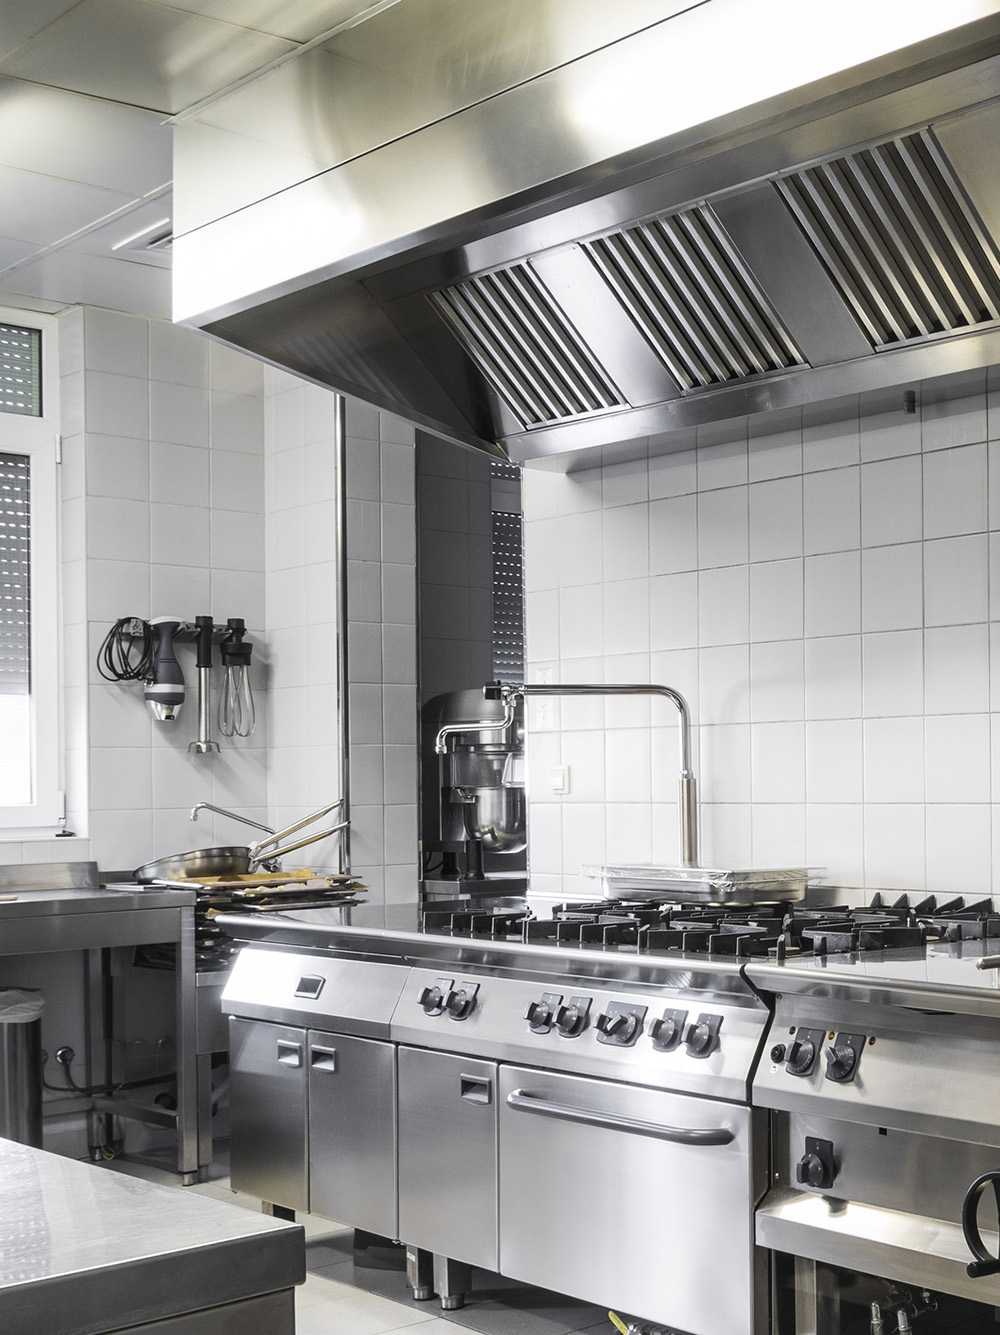 Modern industrial kitchen, white and silver interior